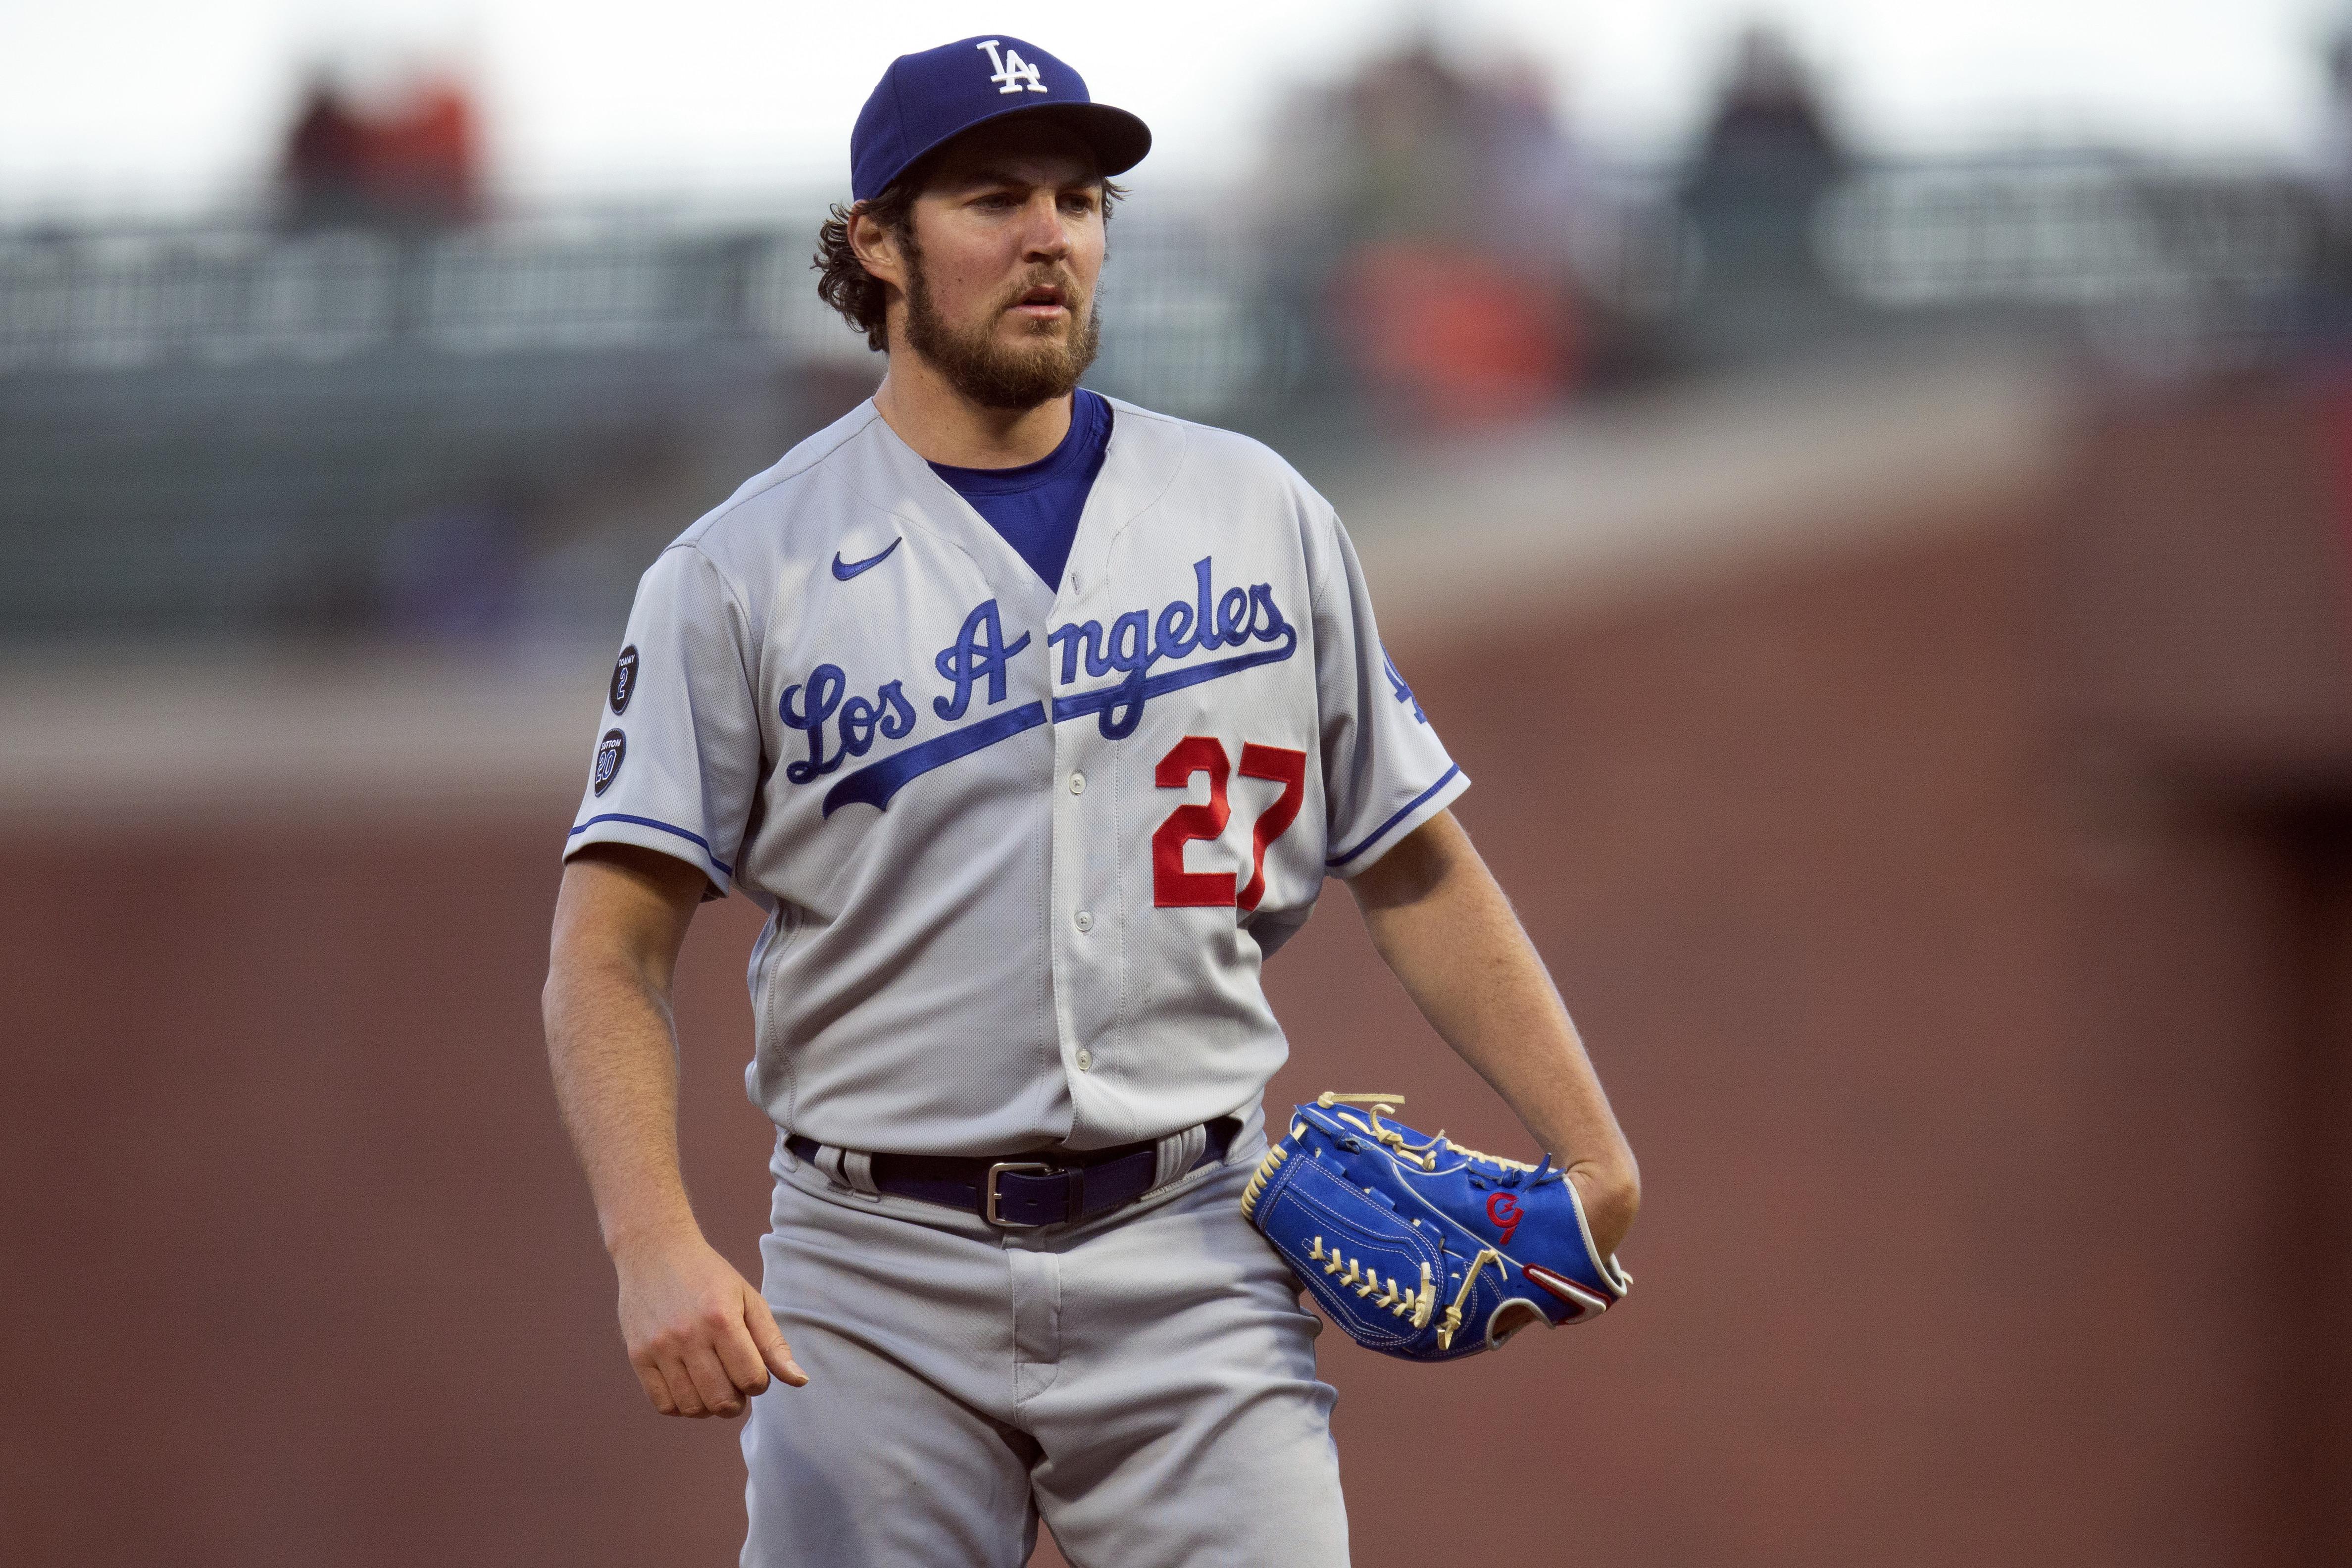 Dodgers' Trevor Bauer Reportedly Under Investigation for Allegedly Assaulting Woman